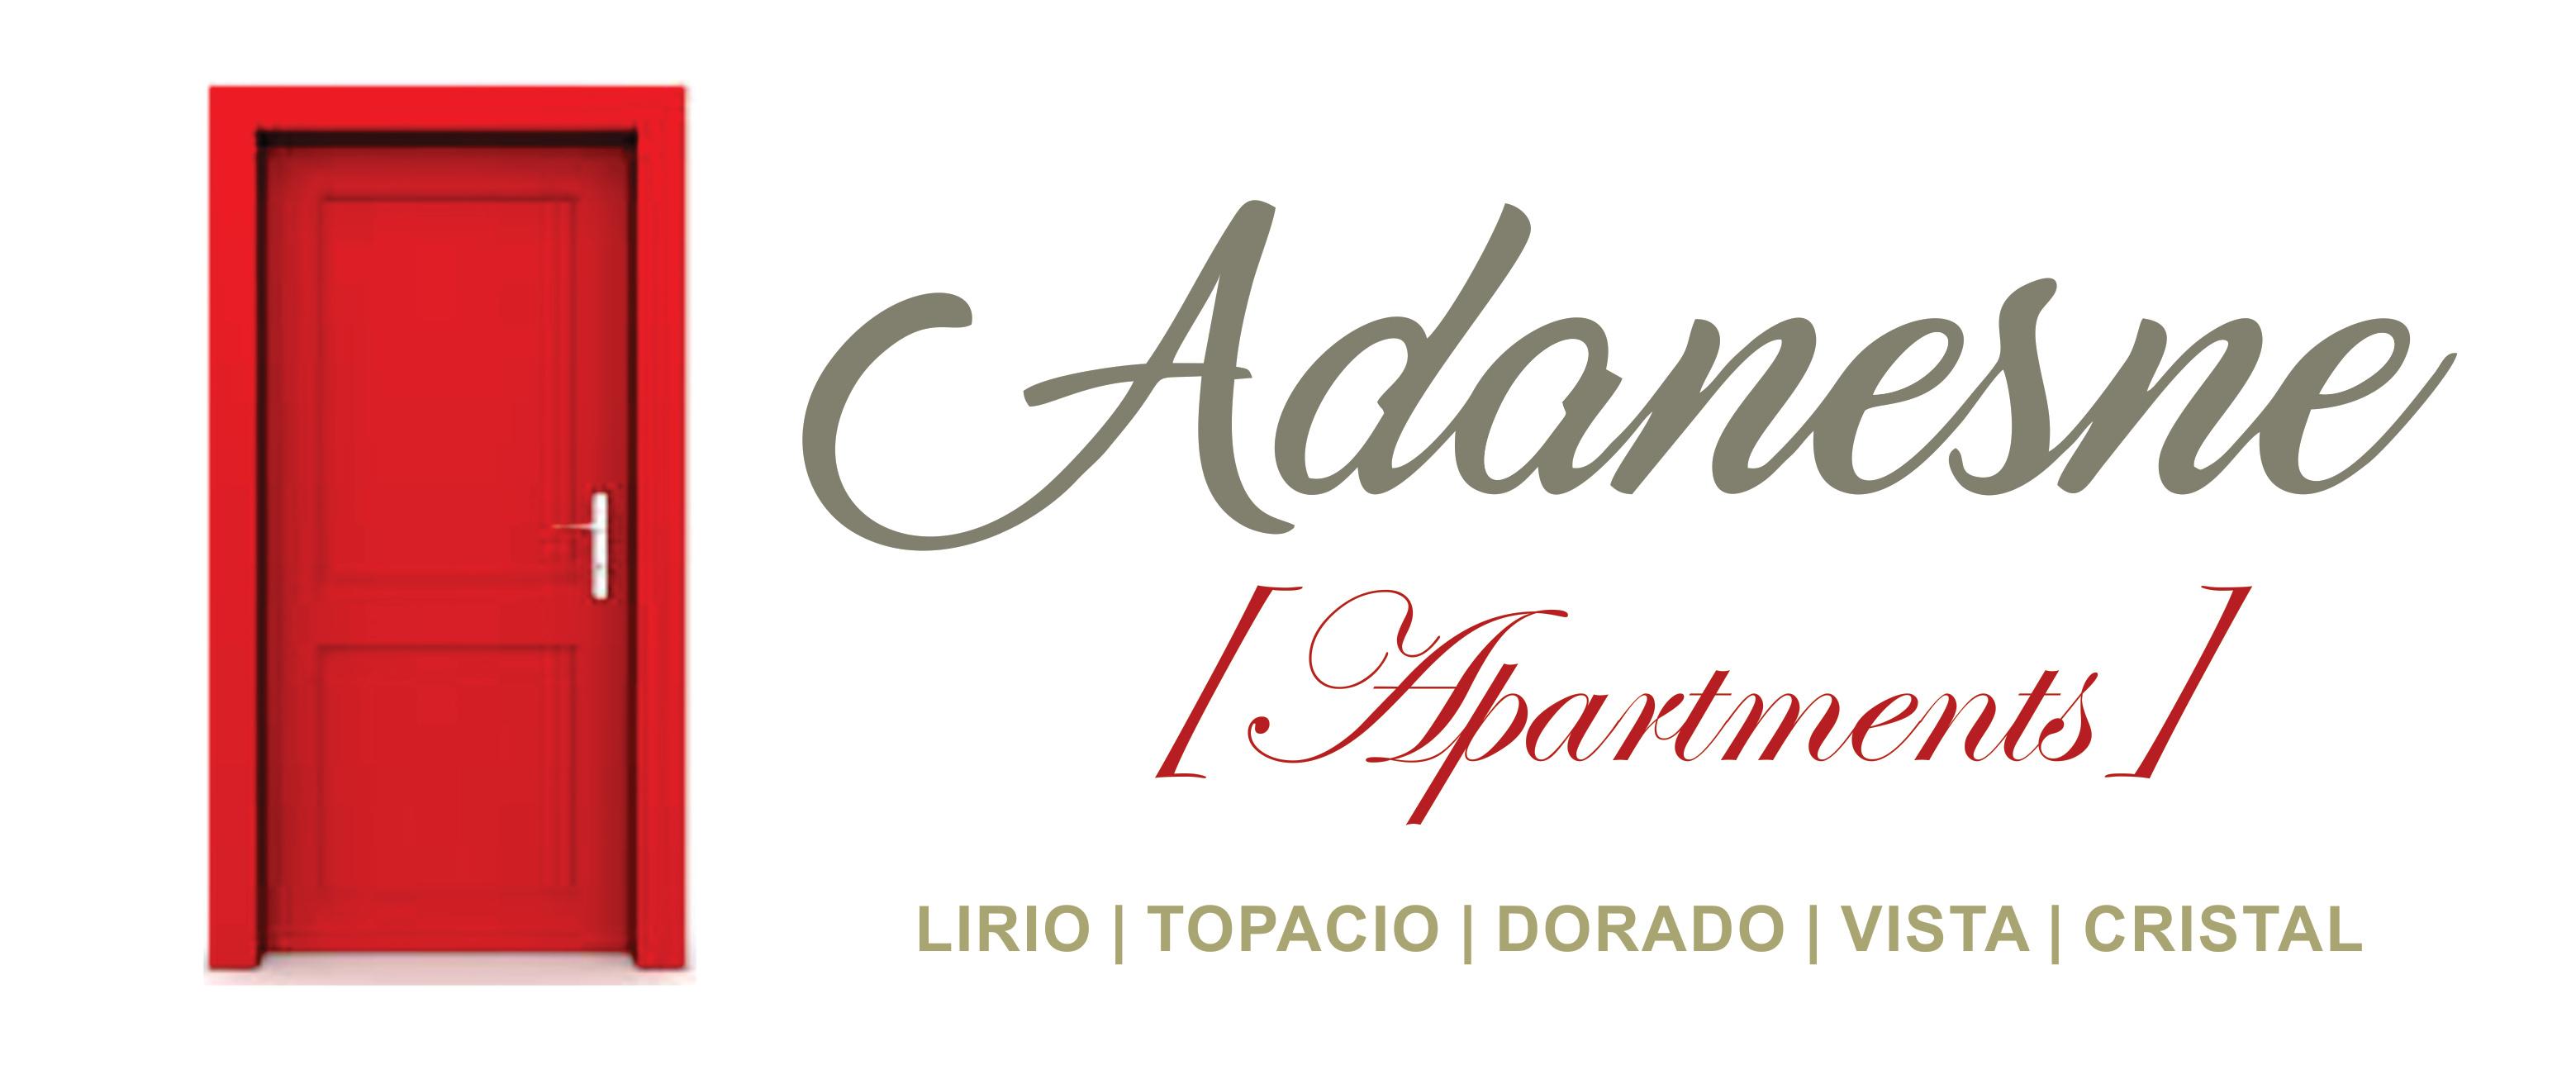 Choose Your Apartment Ensenada Adanesne Apartments